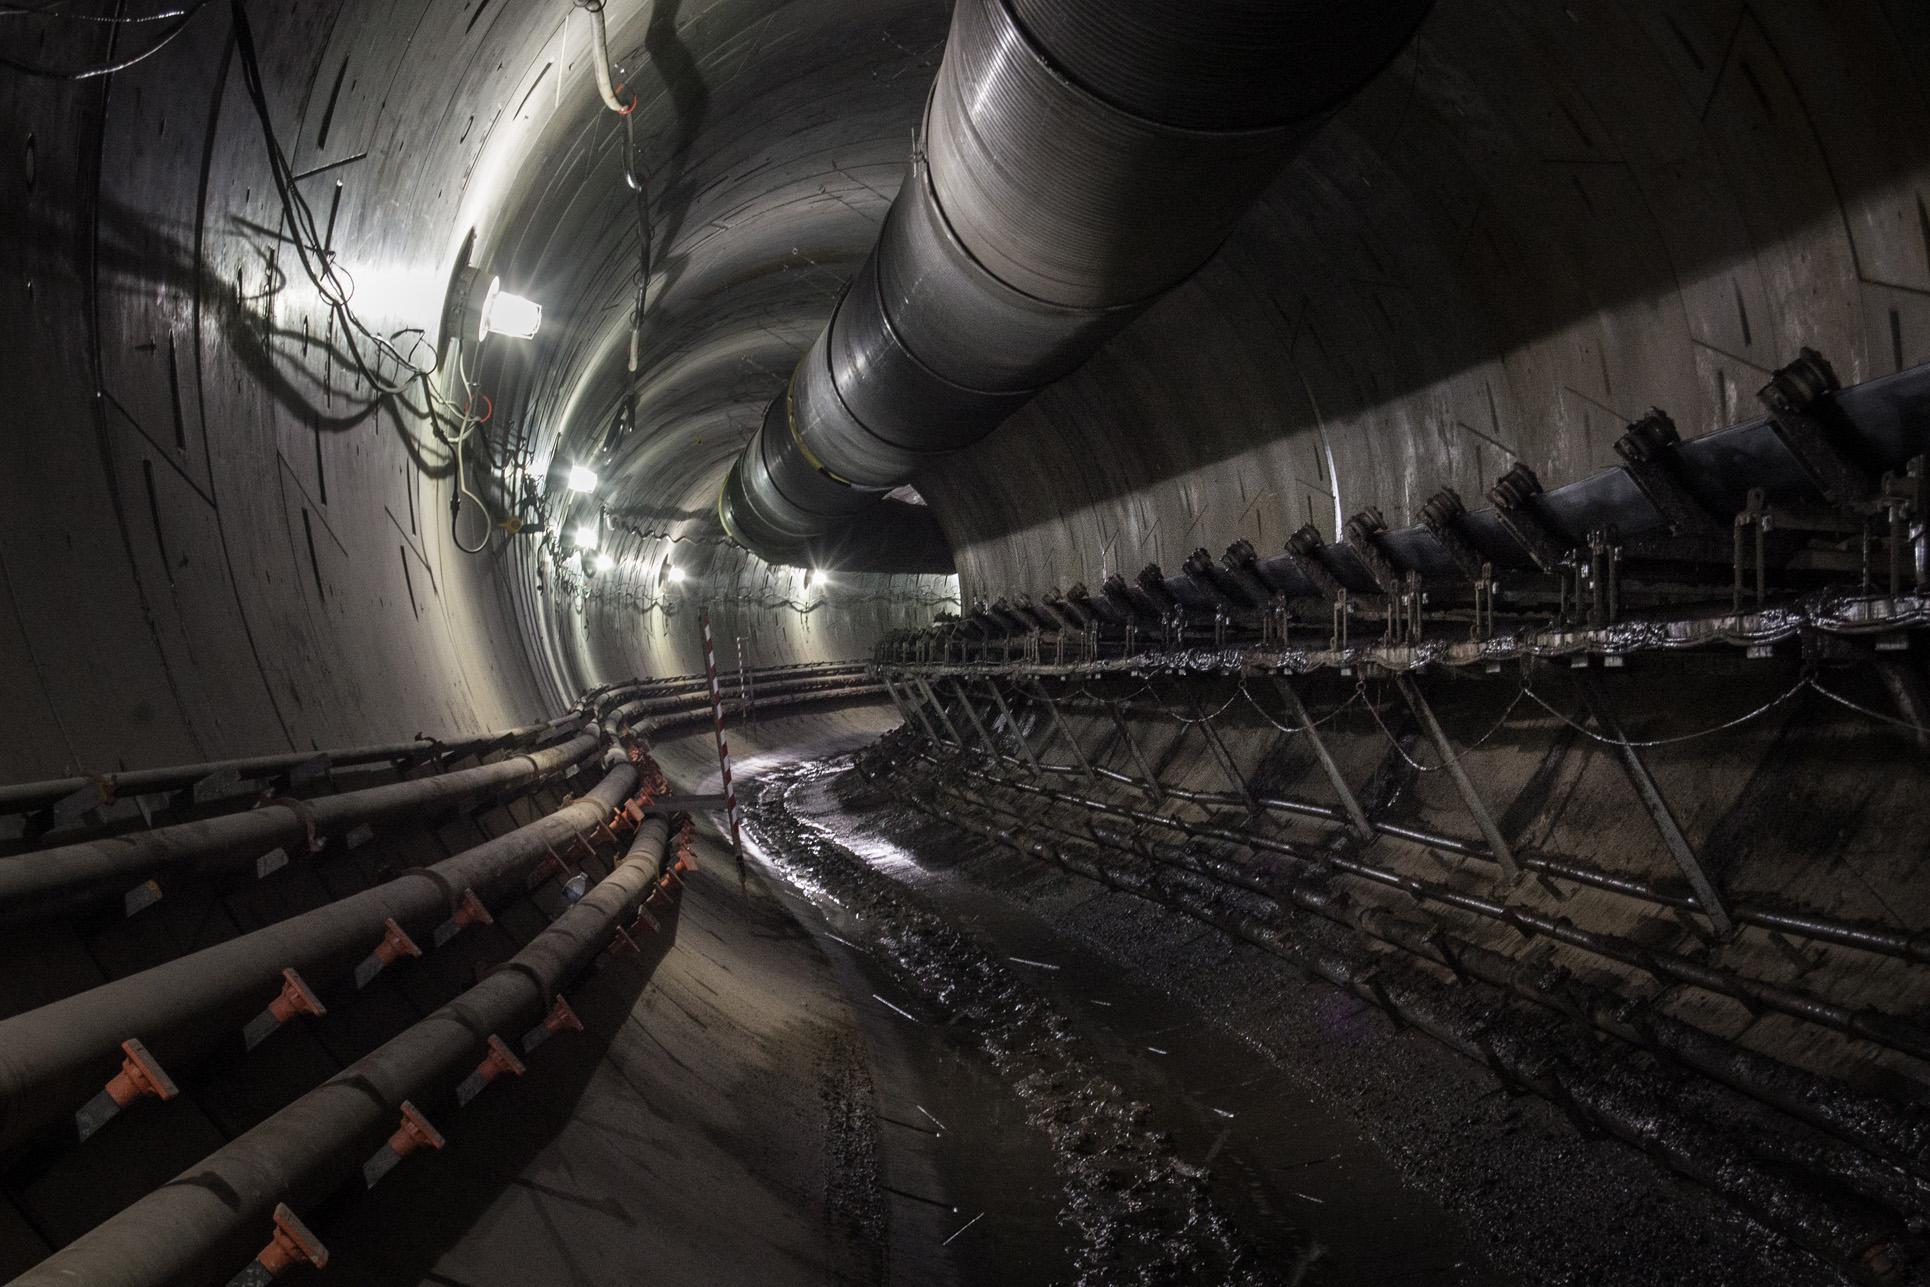 140305_1171_NB_Tunnel_full.jpg